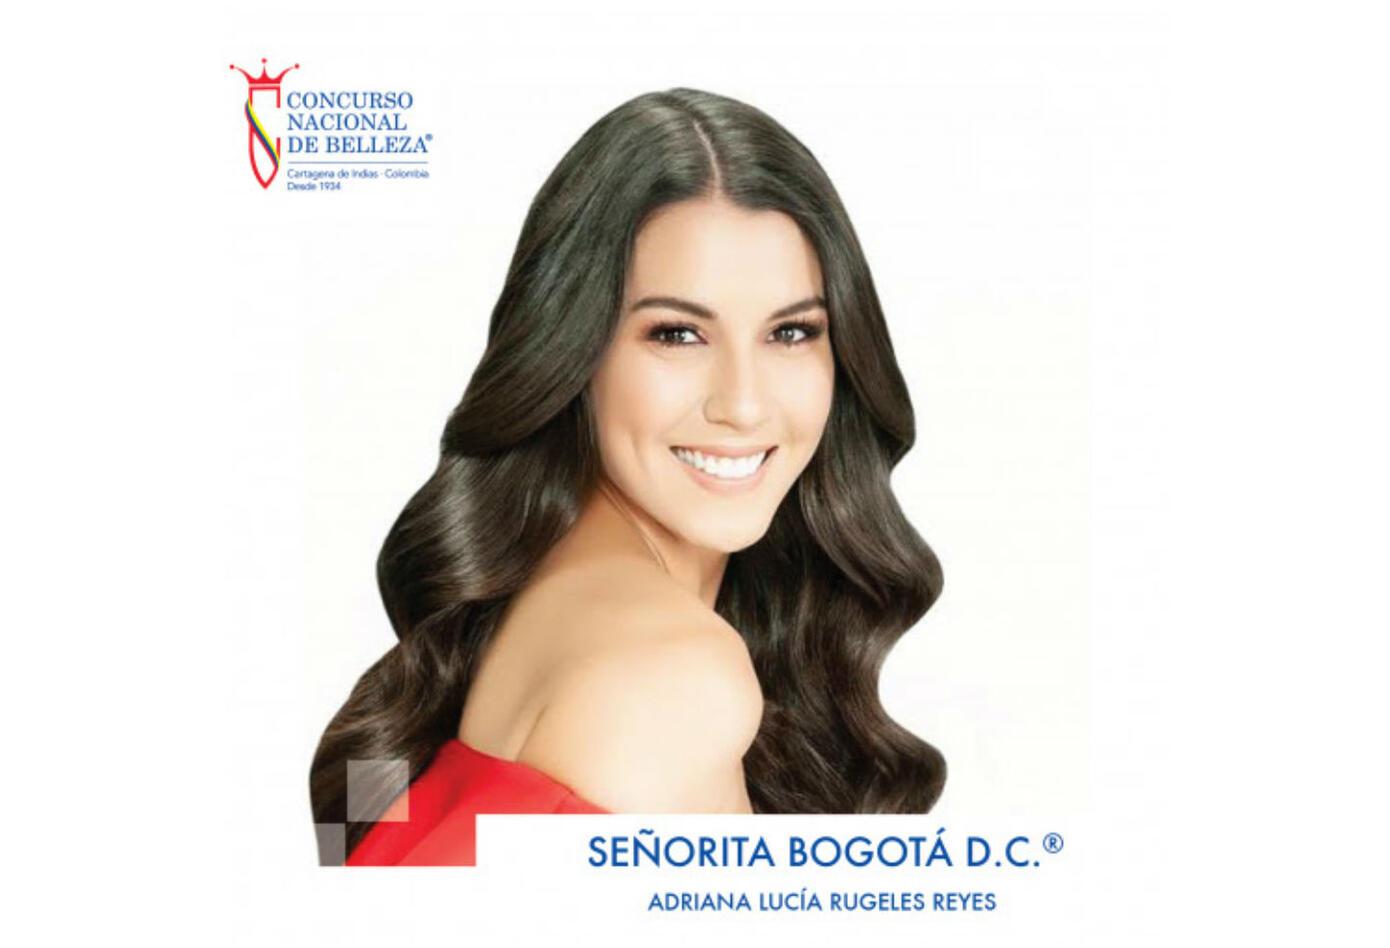 Adriana Lucía Rugeles, señorita Bogotá 2019